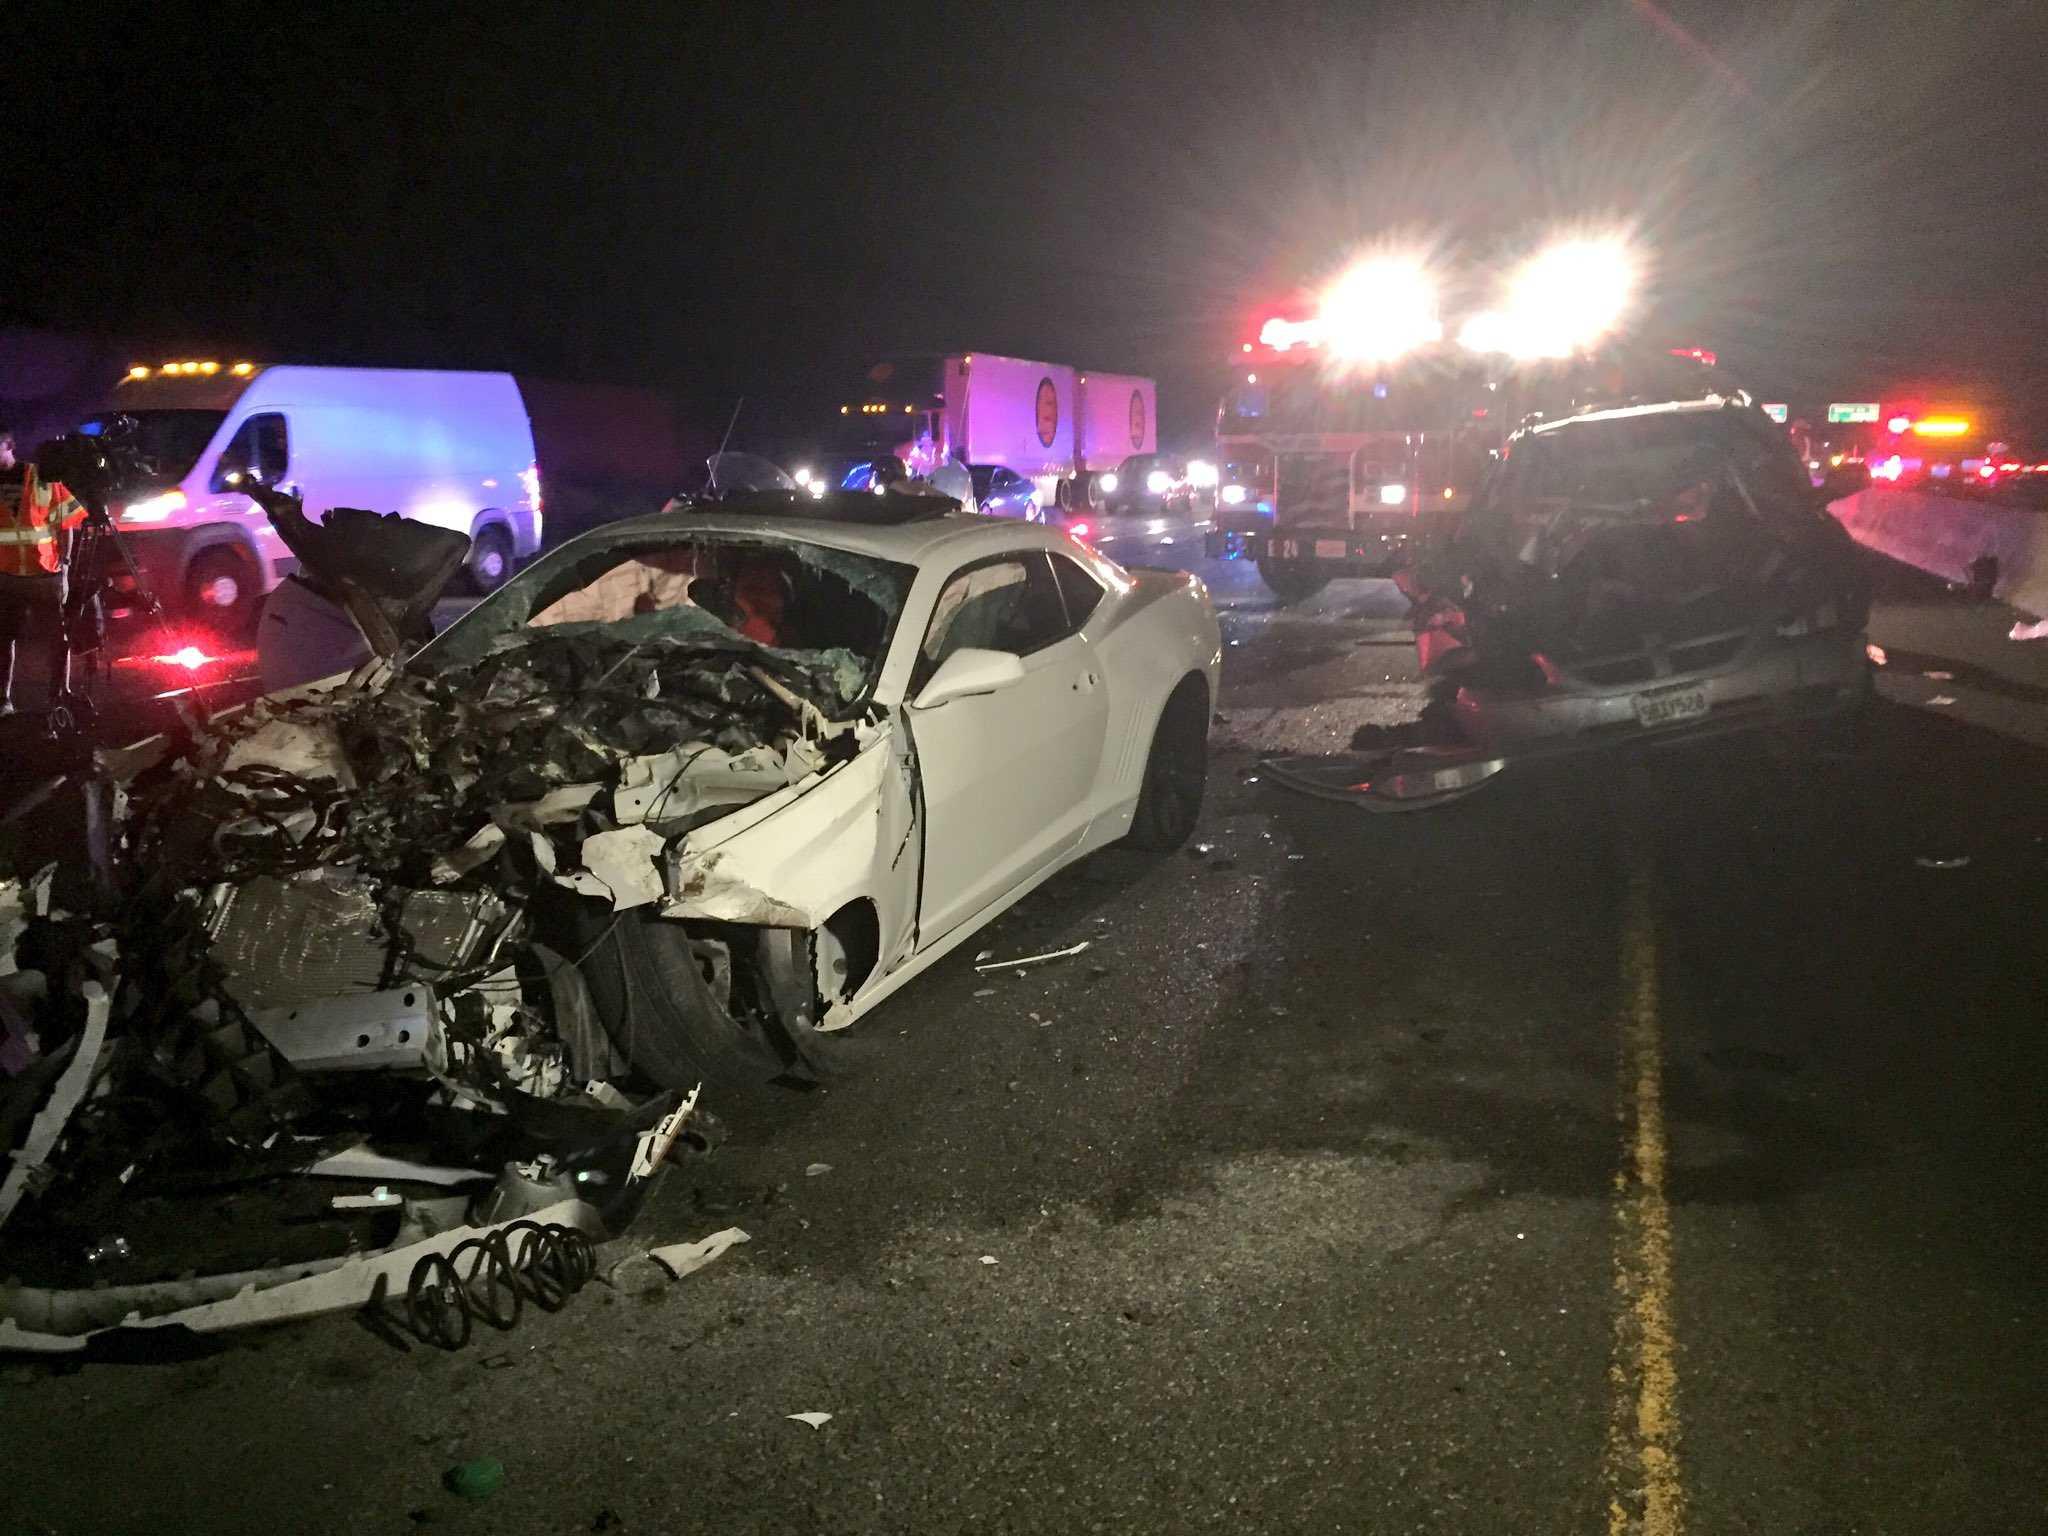 2 killed in Sacramento County crash on I-80 - Modesto news - NewsLocker